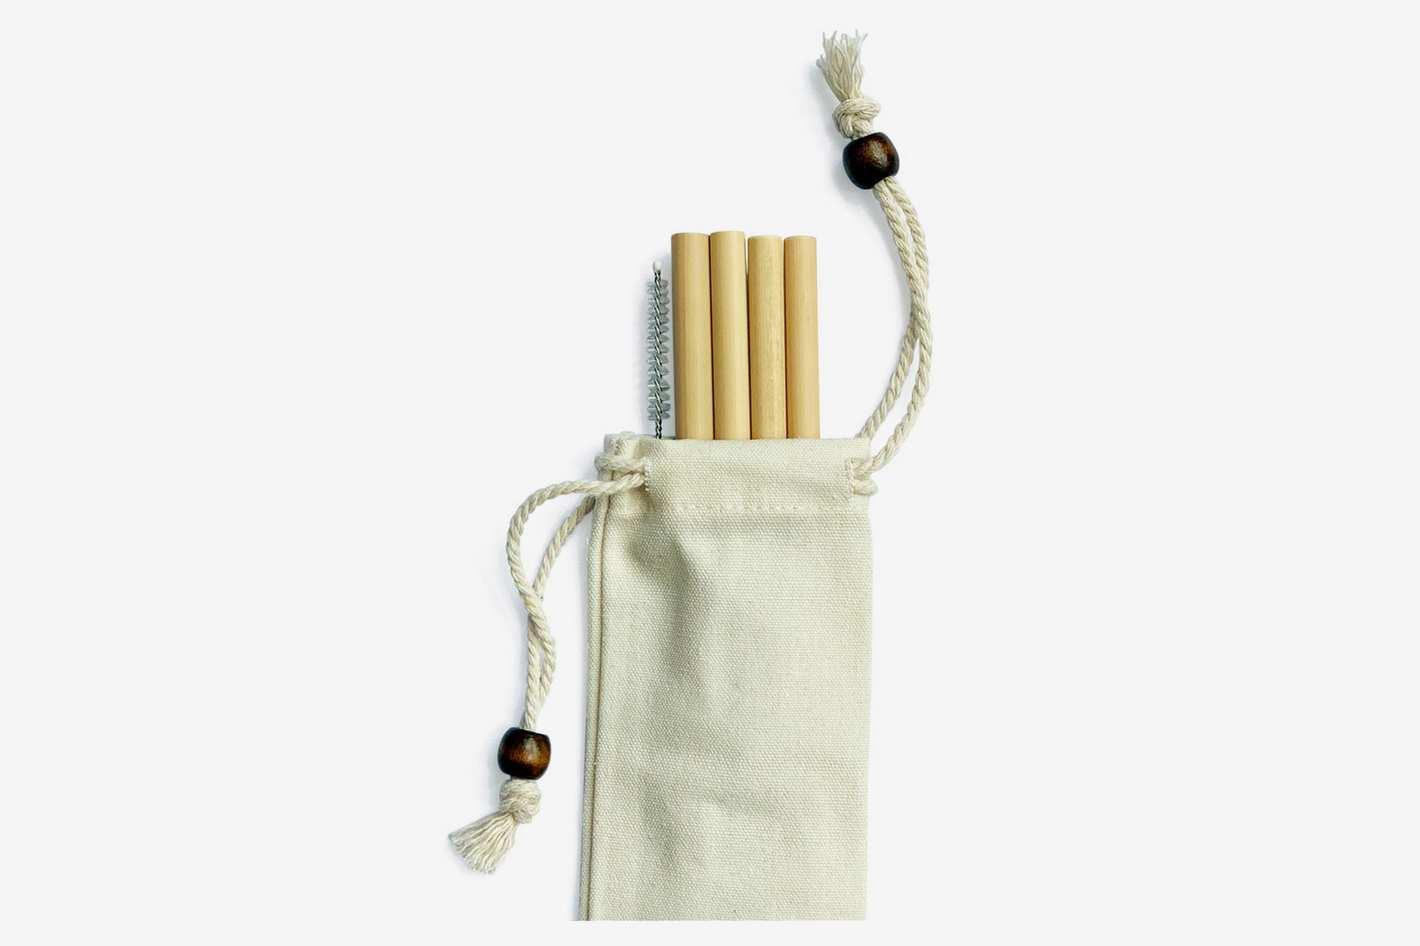 Bamboo Straw Girl X Goop Bamboo Straws, Set of 4